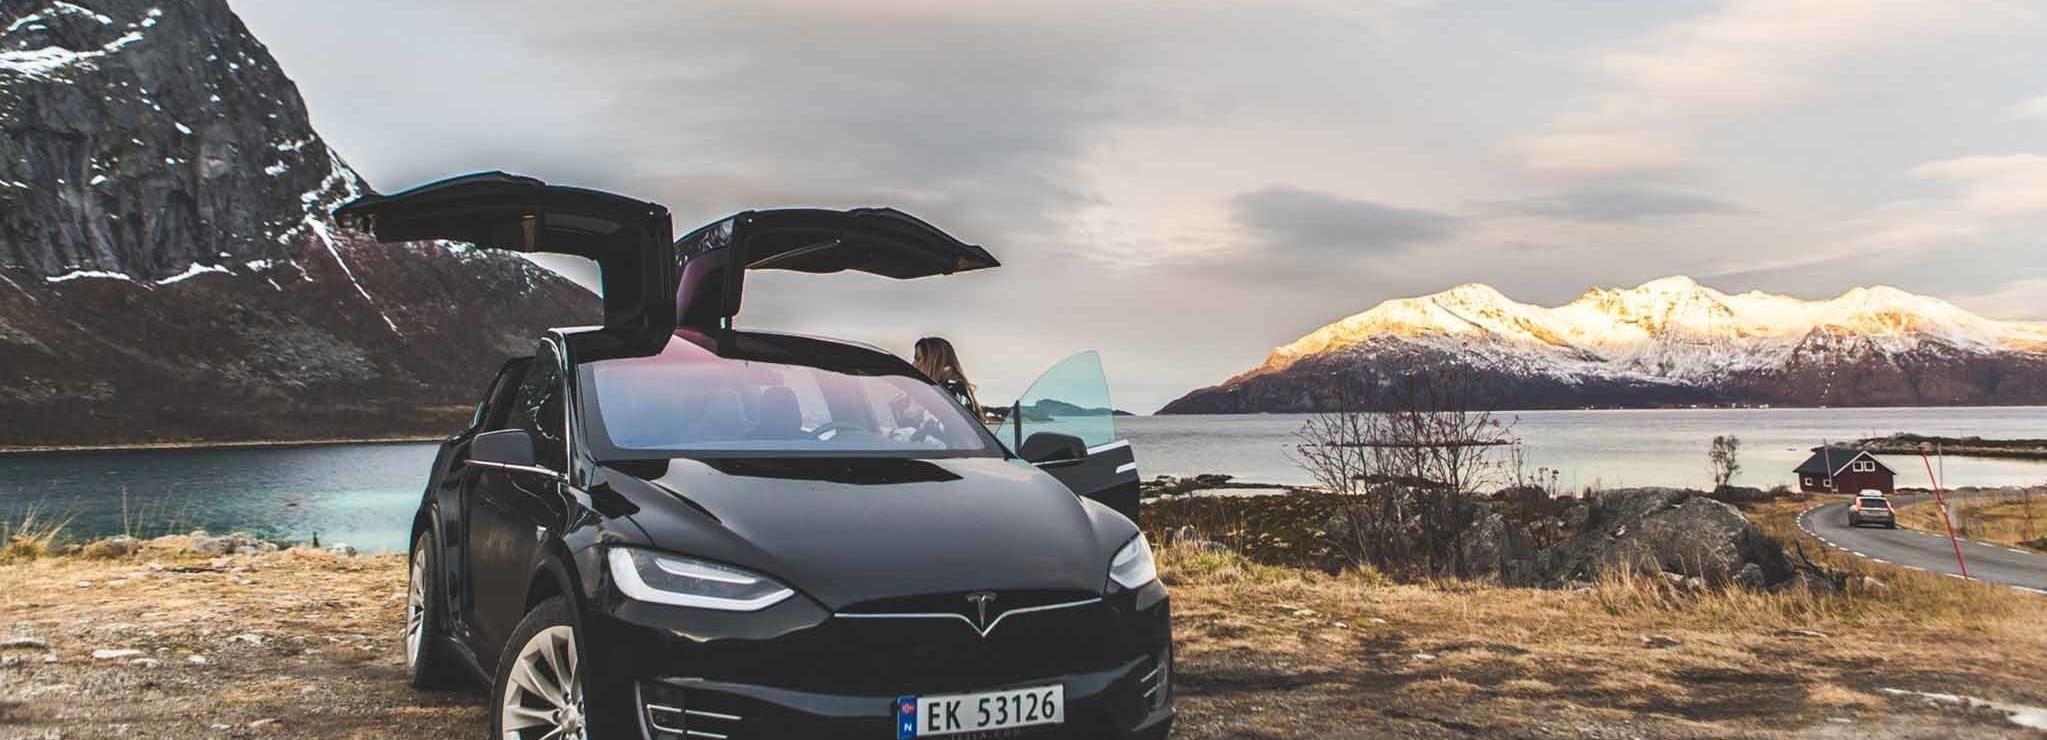 Tromsø: Tesla x Fjord Bezienswaardigheden